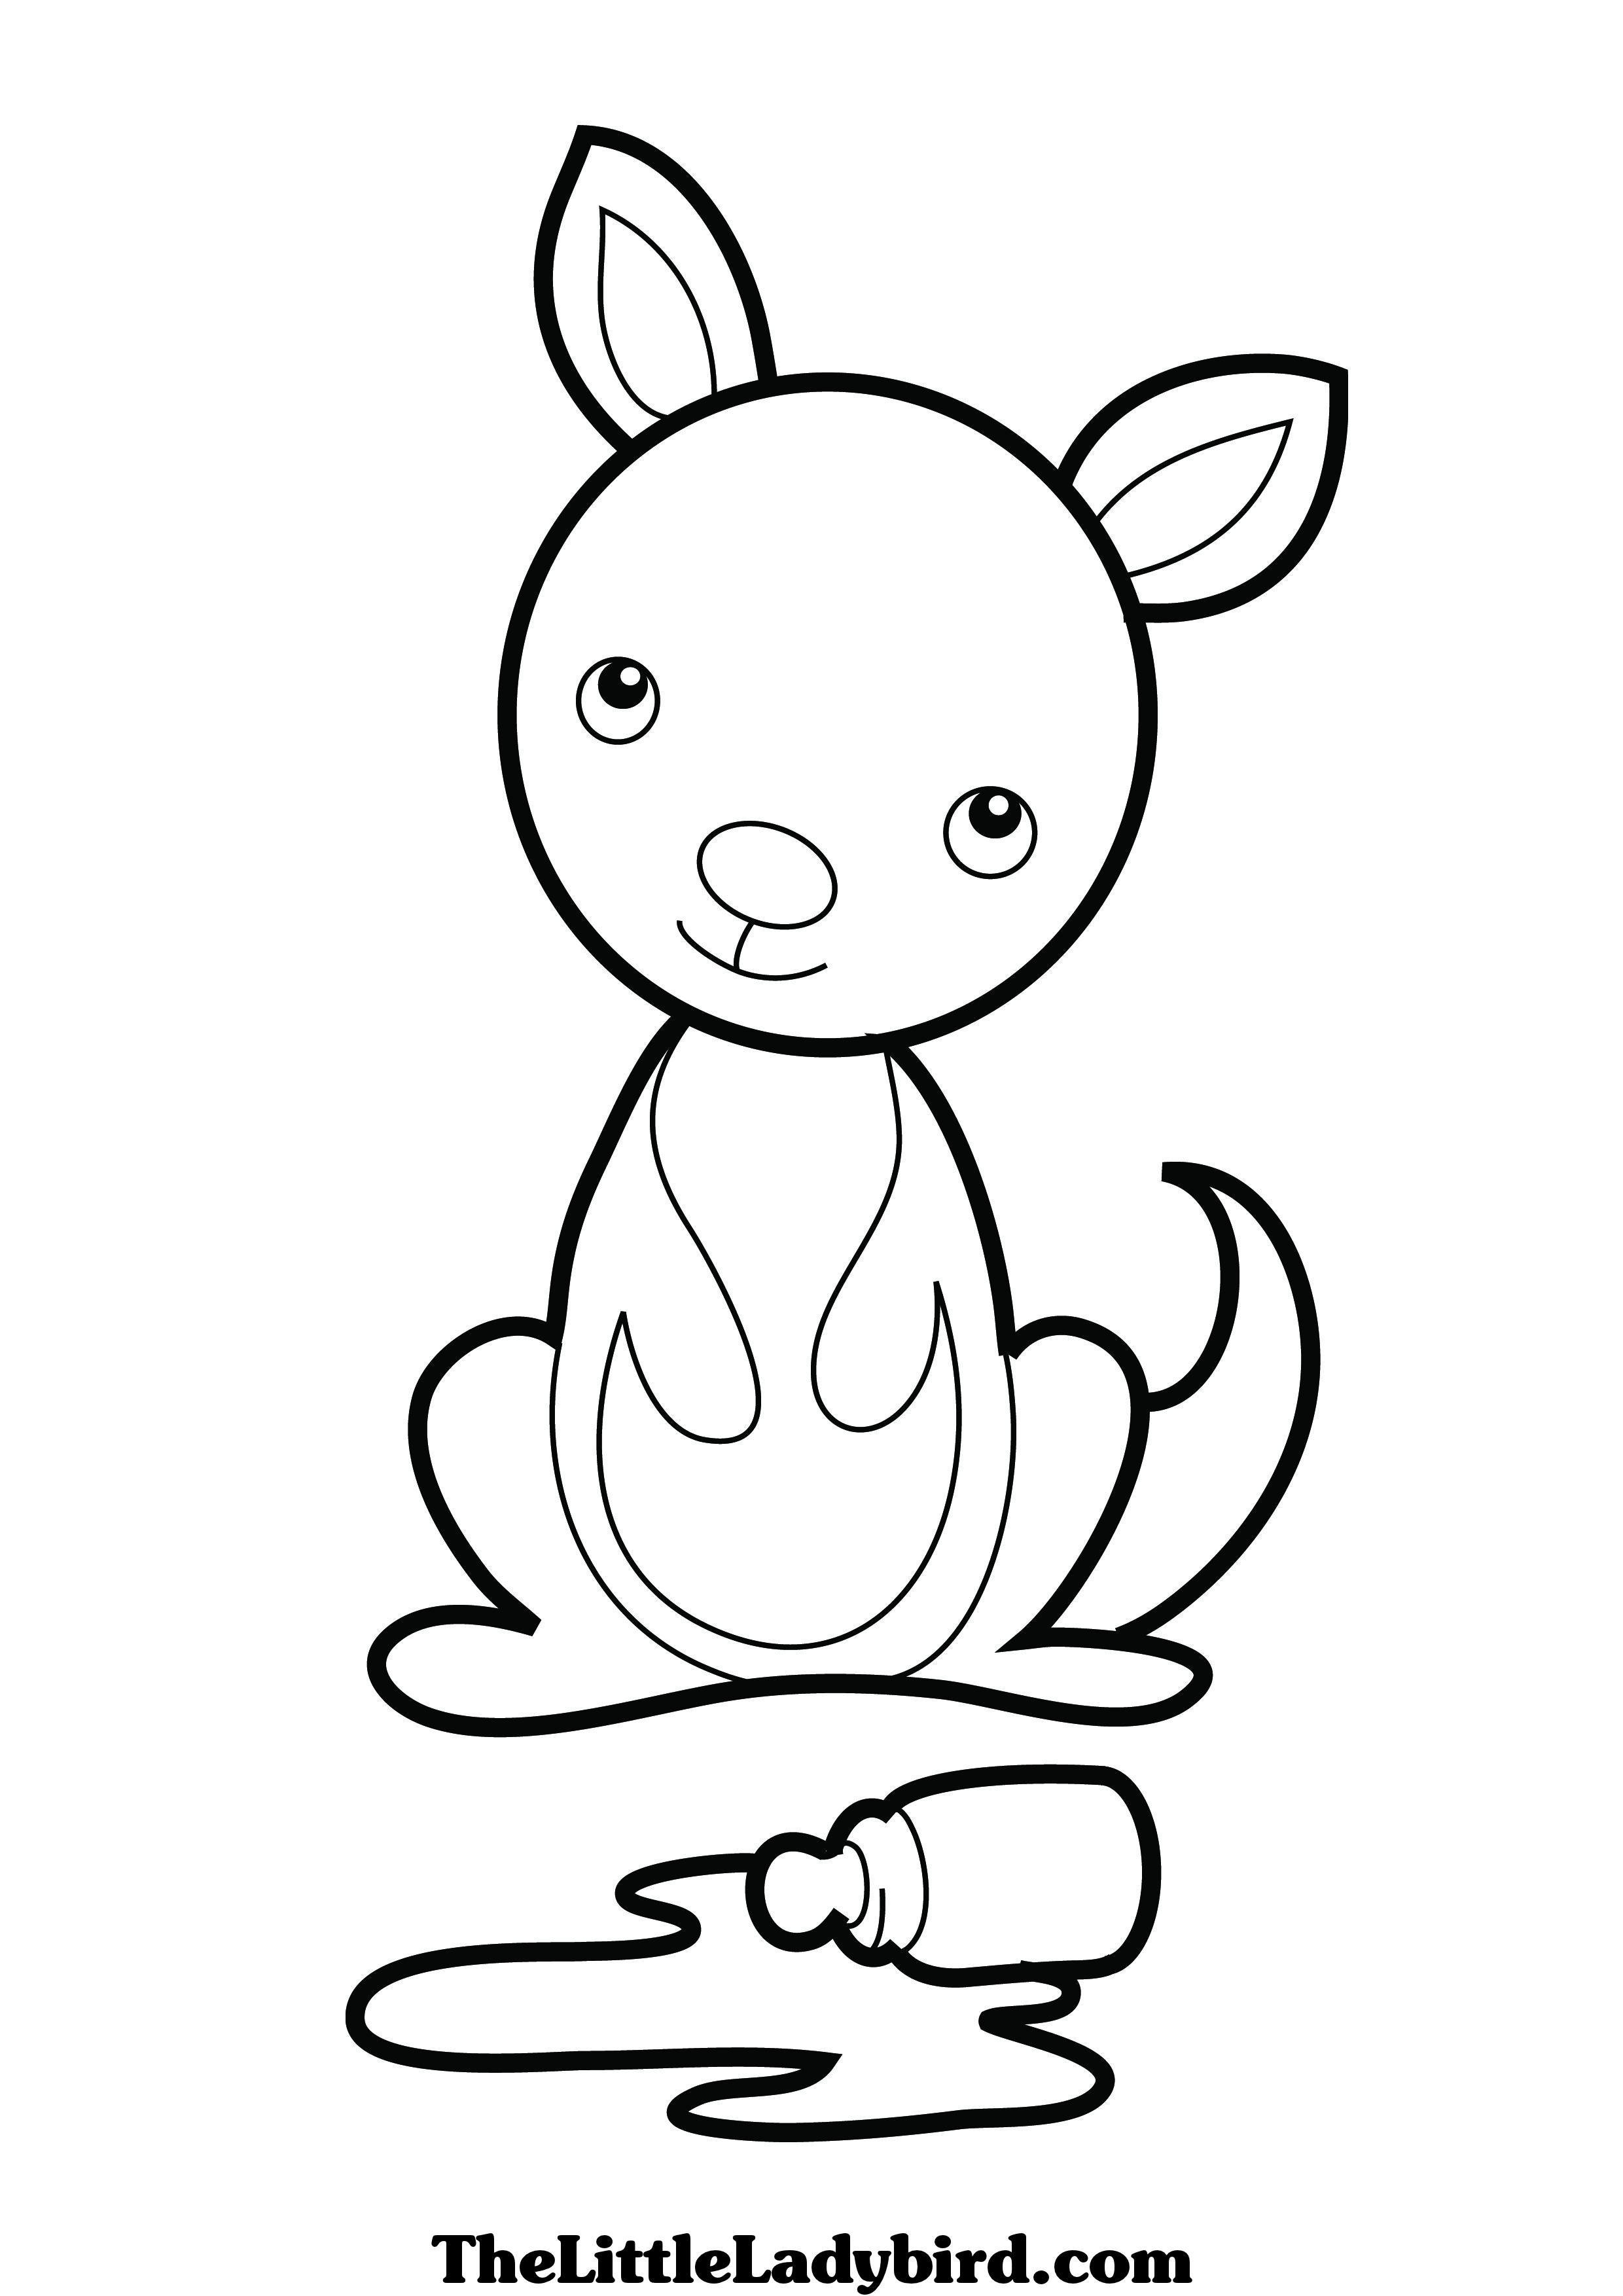 Baby Kangaroo Drawing at GetDrawings.com | Free for personal use ...